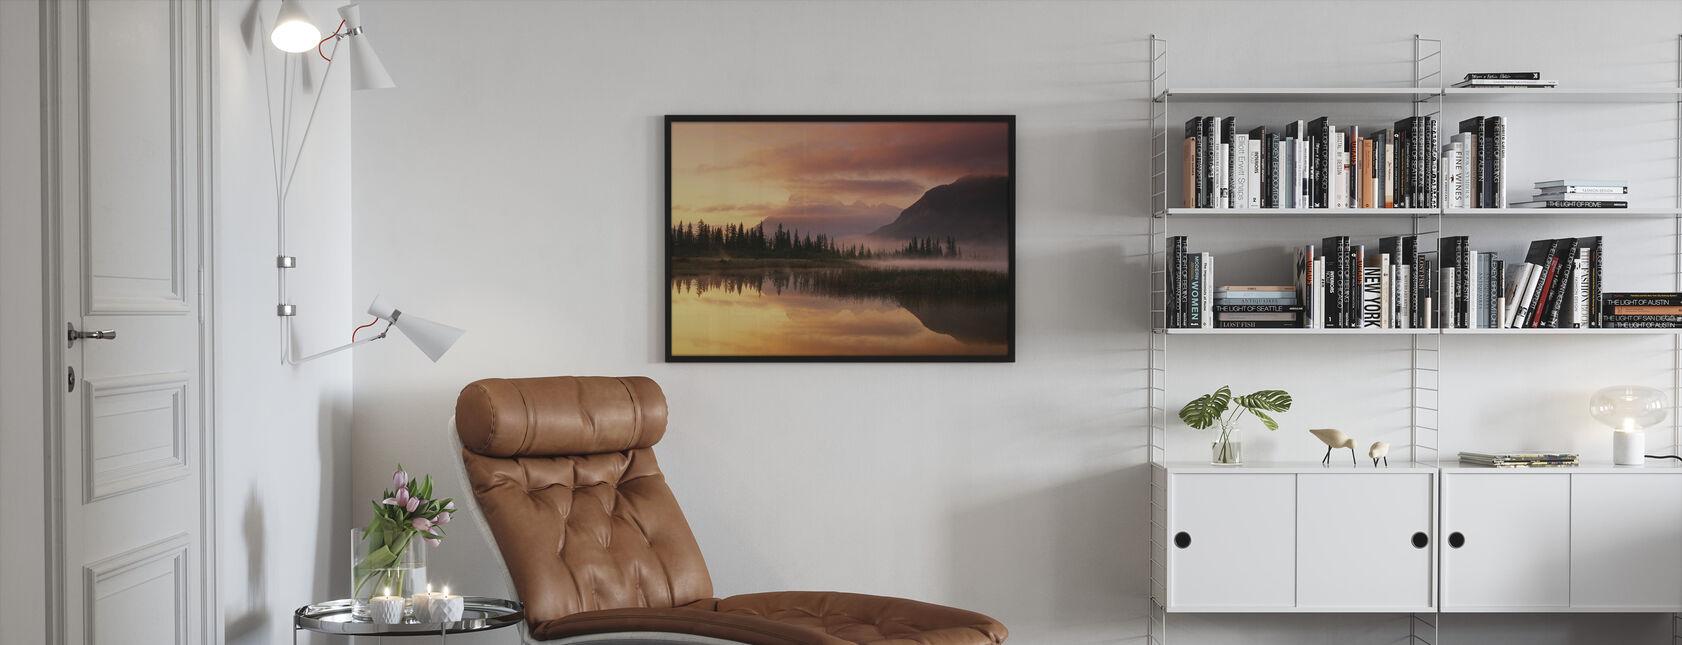 Oranje Reflectie - Ingelijste print - Woonkamer